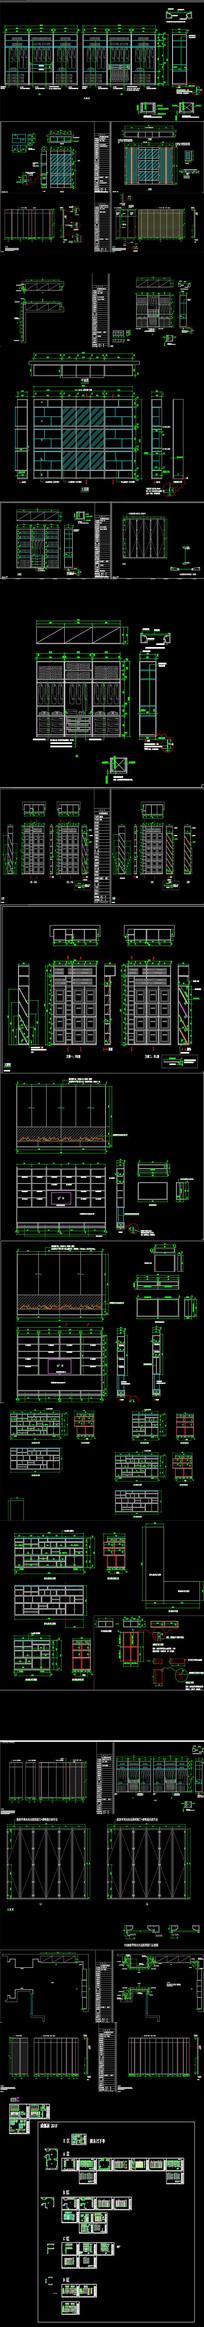 新轻奢展厅CAD施工图